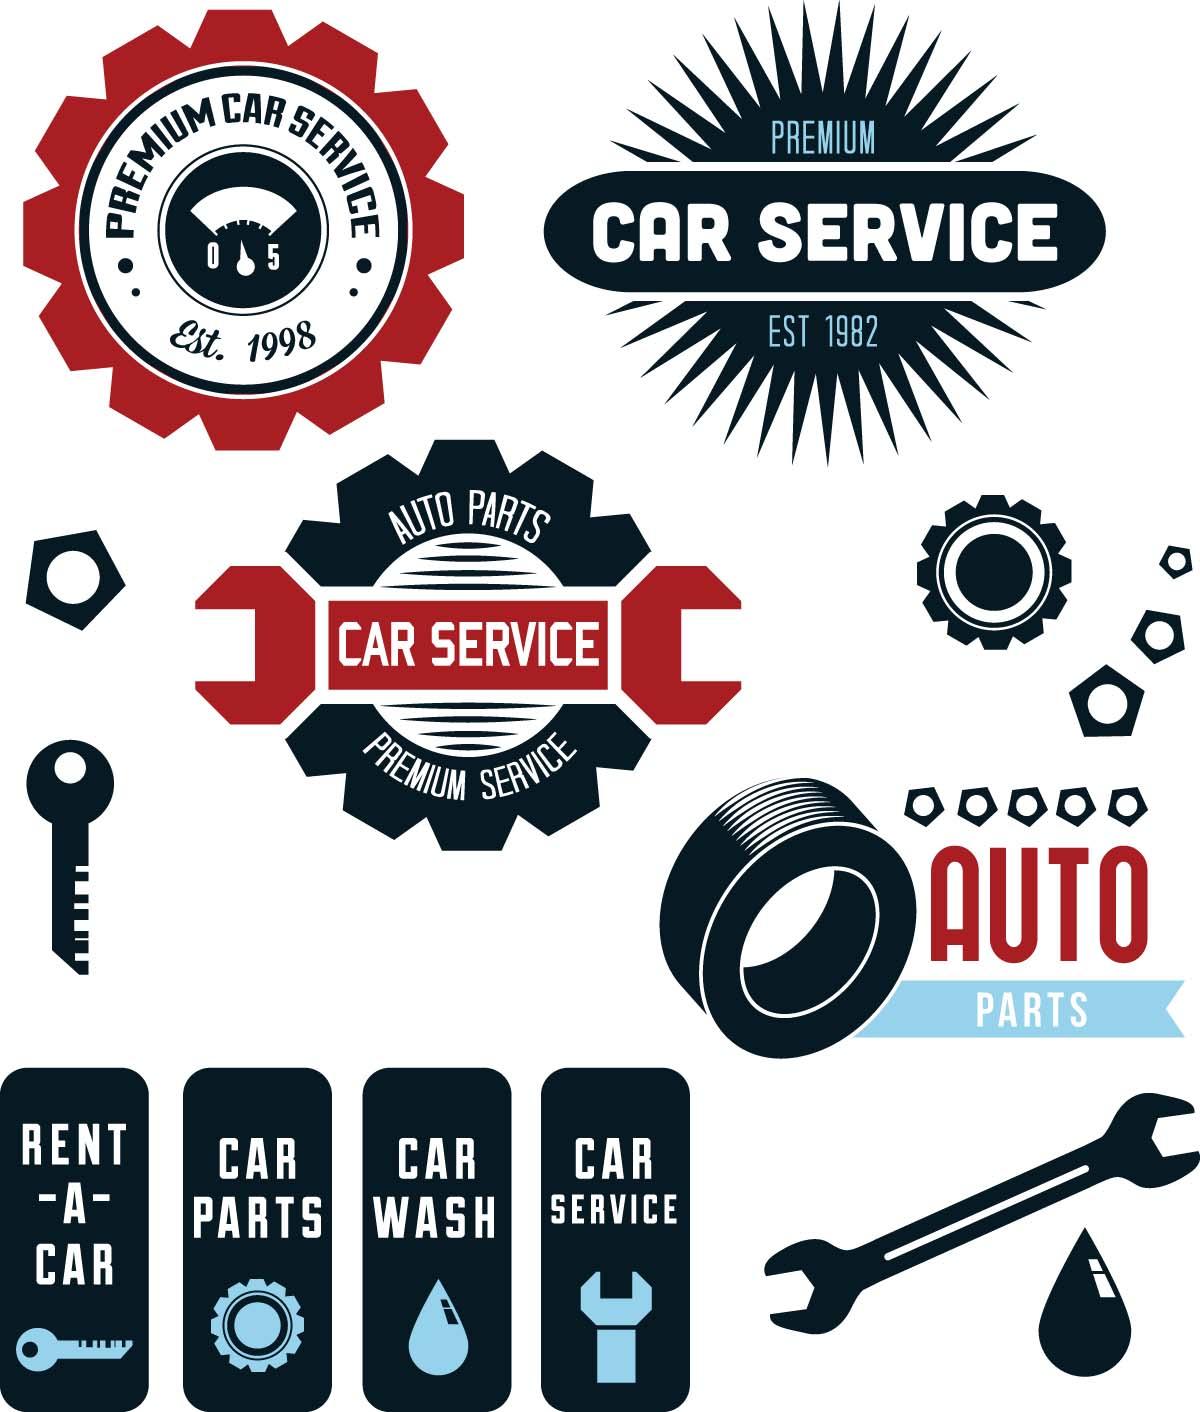 Automotive repair logo clipart clip art library stock 15 Old Auto Repair Shops Icons Images - Auto Mechanic Repair Logo ... clip art library stock